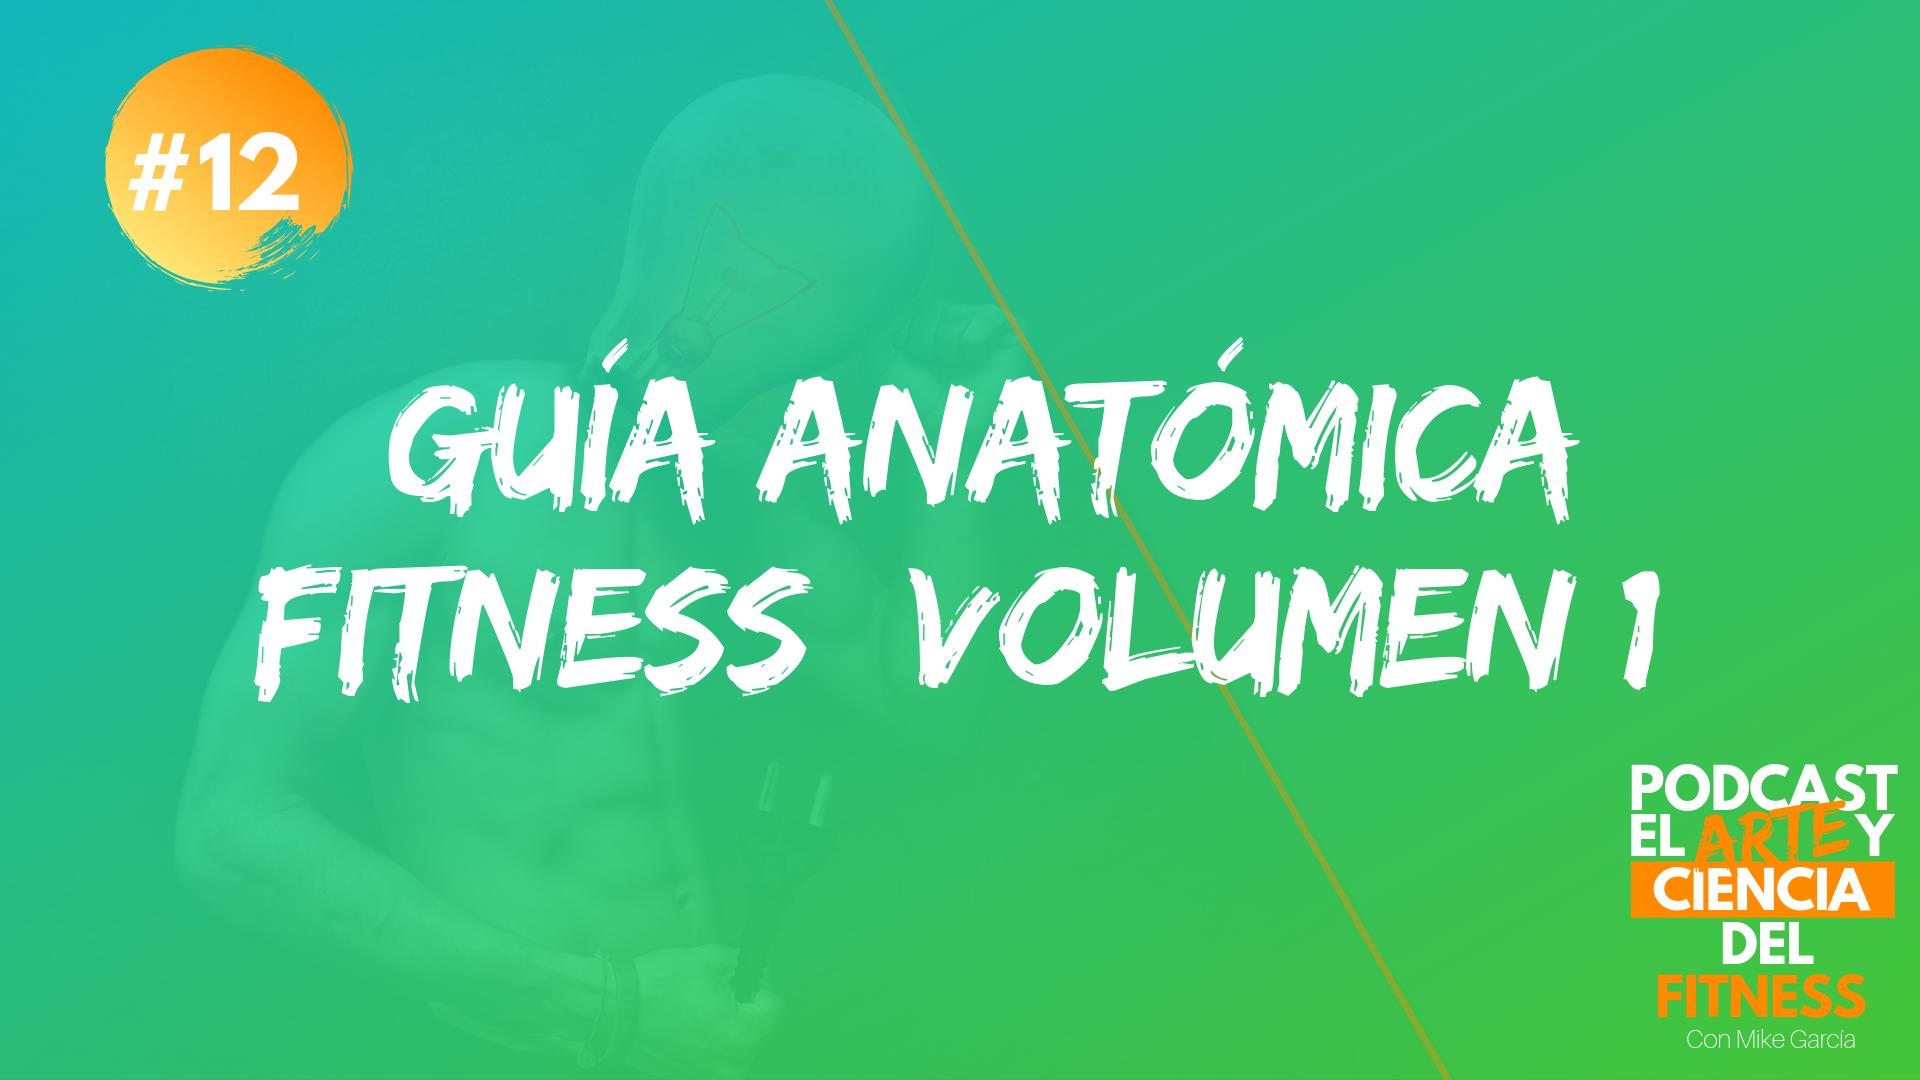 Podcast #12: Guía Anatómica Fitness (Volumen 1)